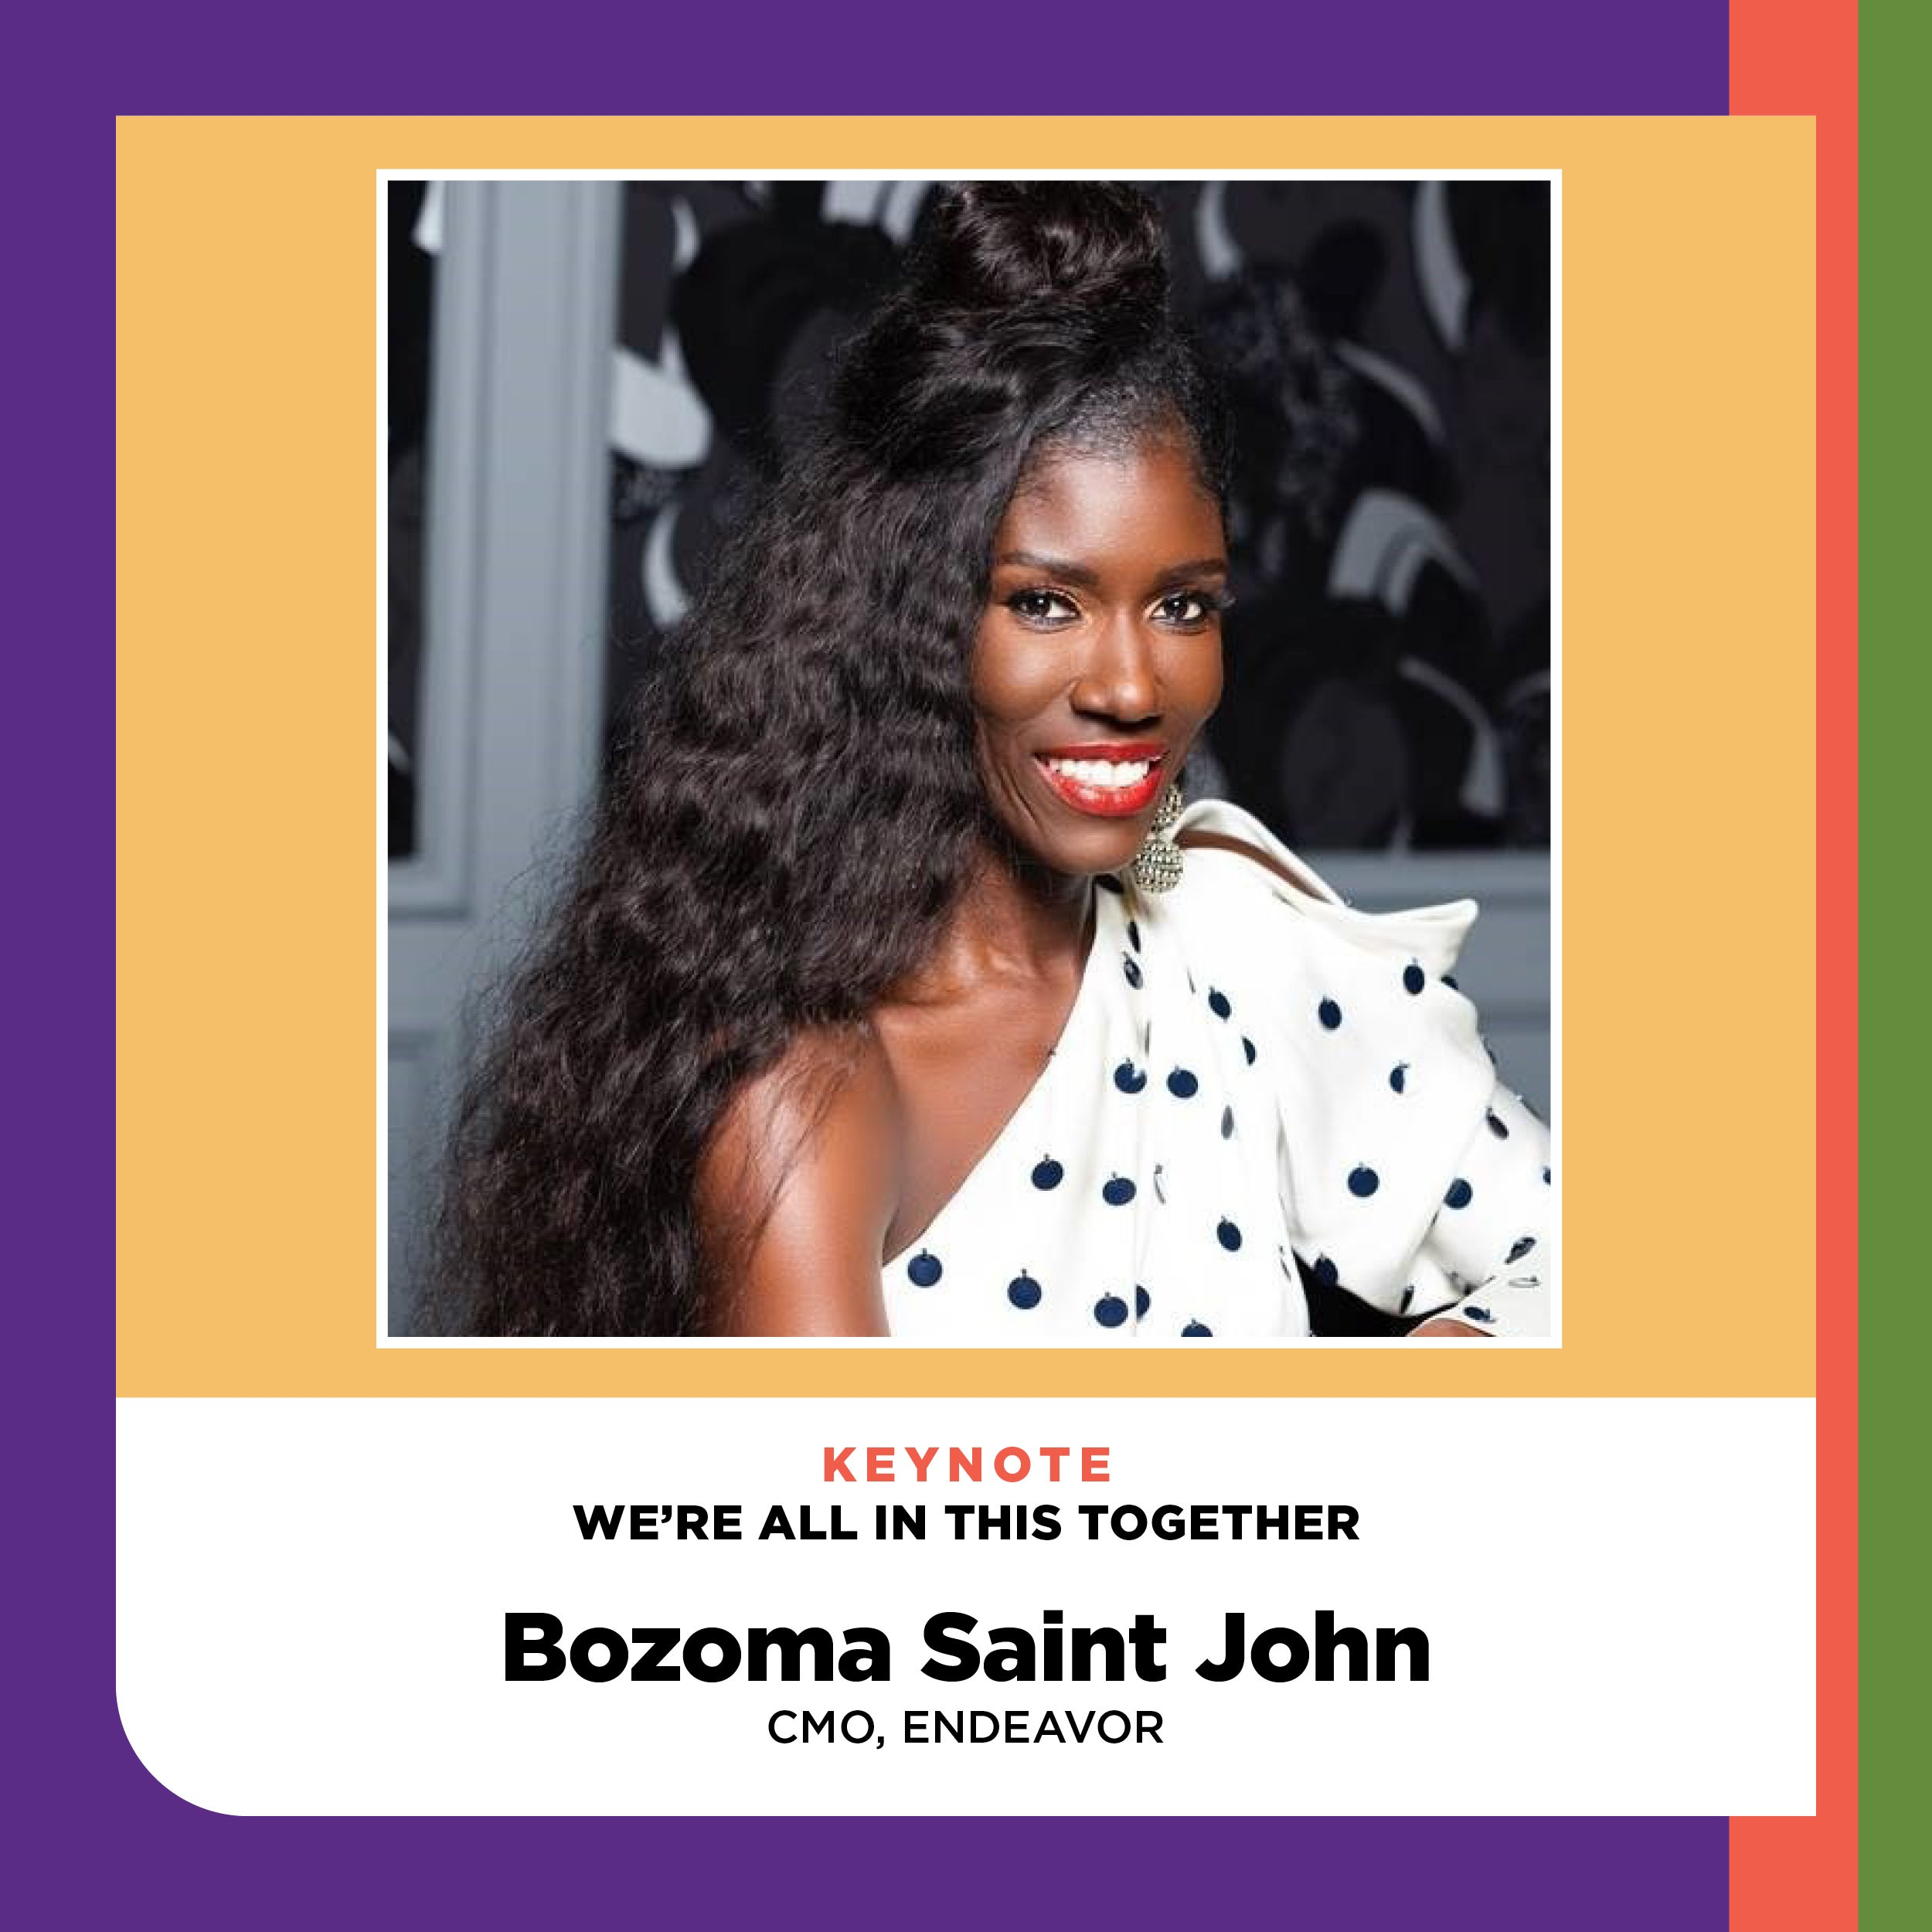 Bozoma Saint John